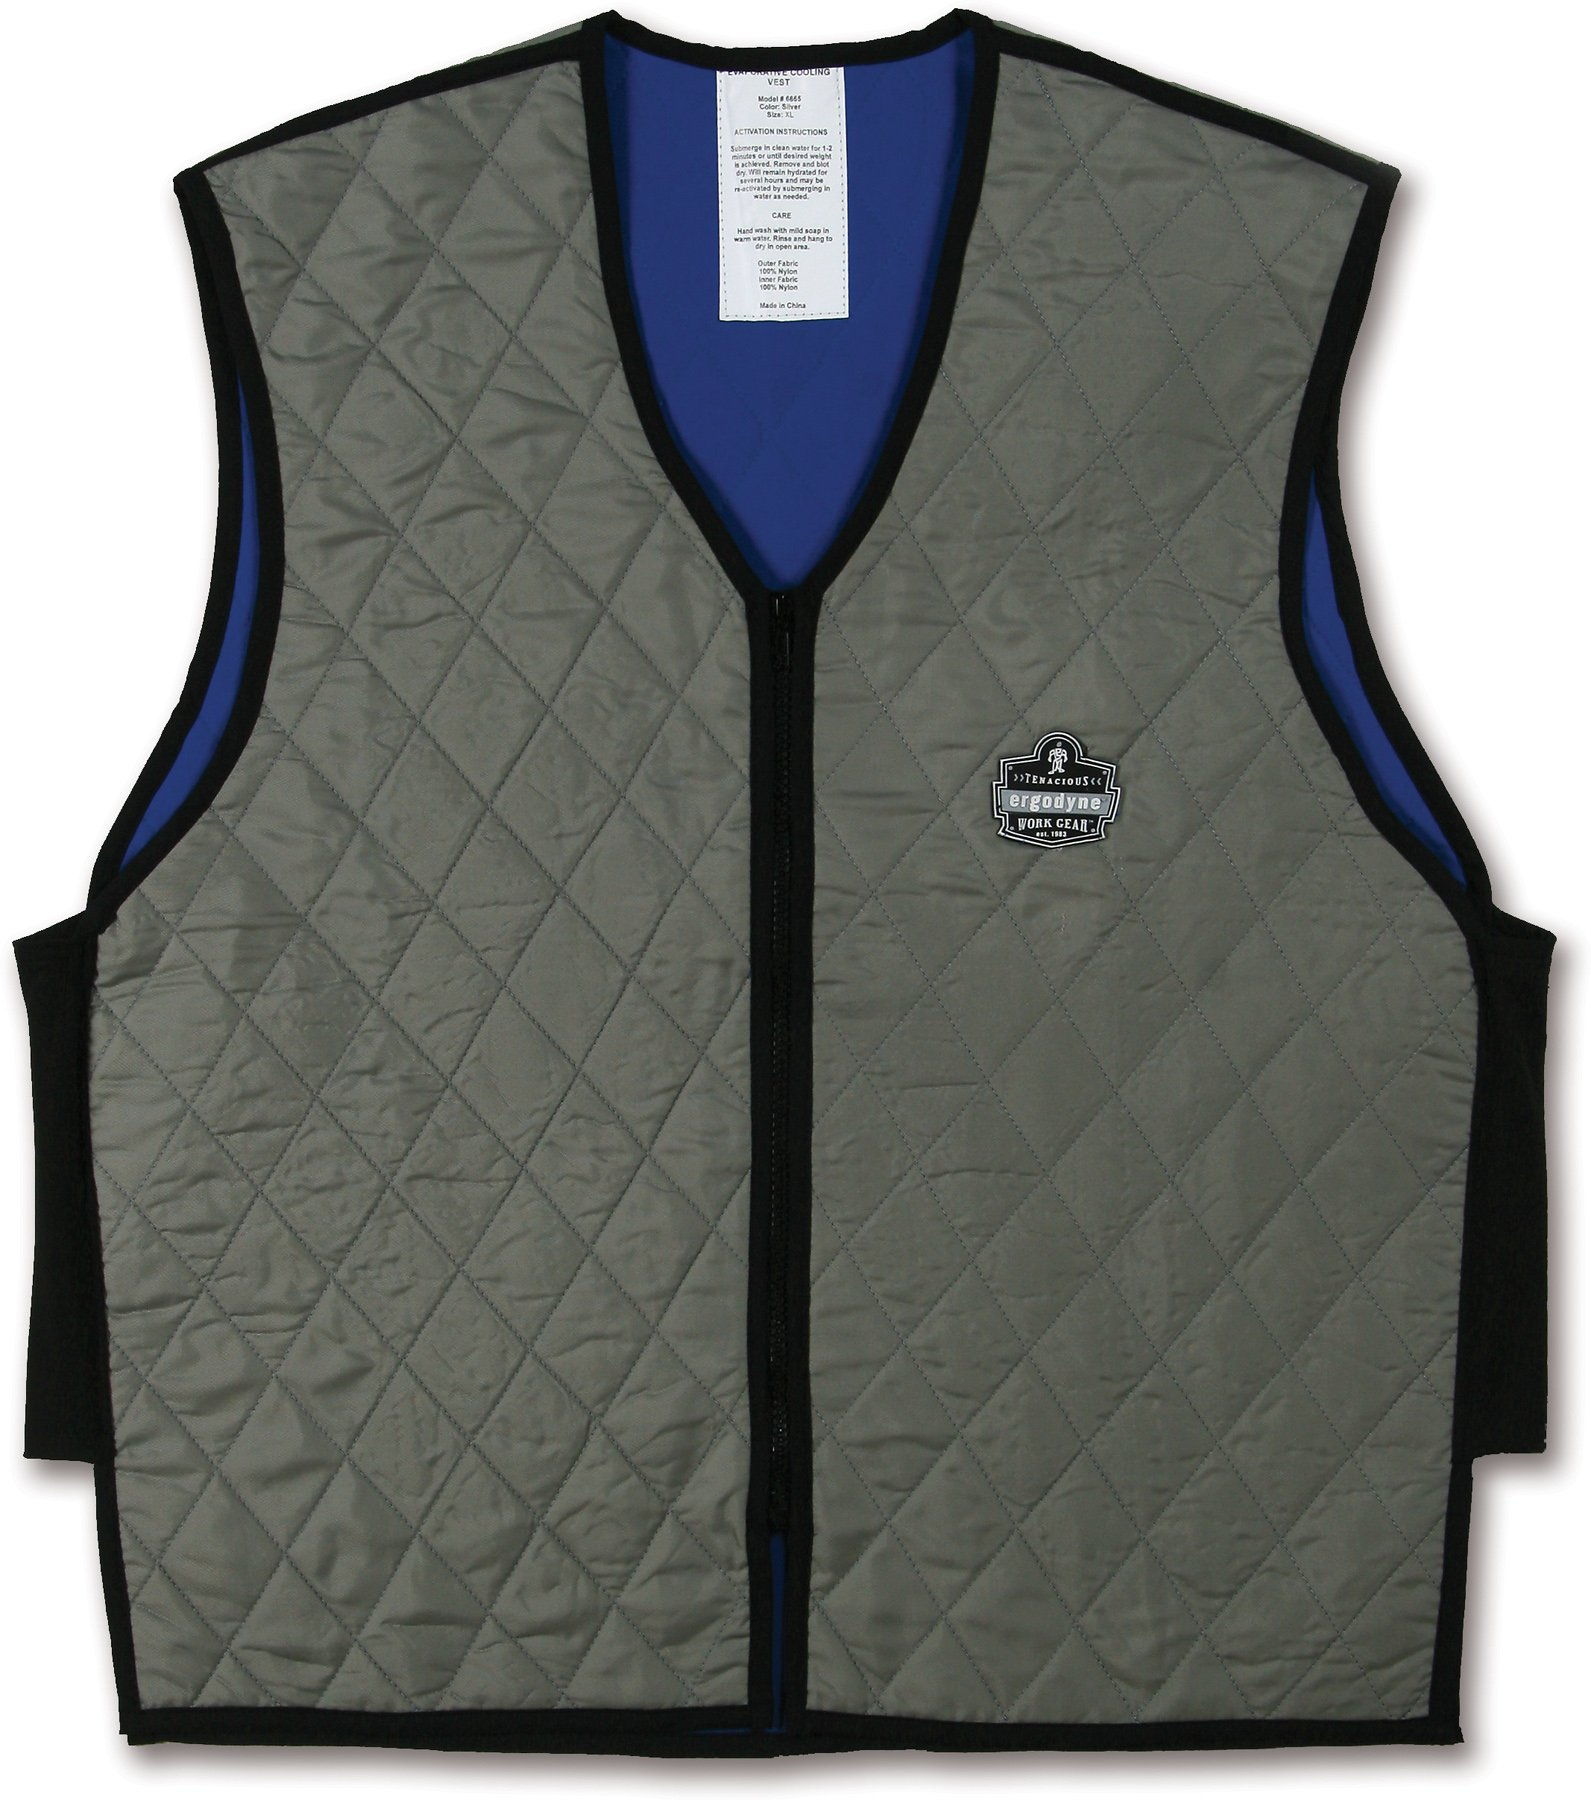 Ergodyne Chill-Its 6665 Evaporative Cooling Vest - Gray, Large